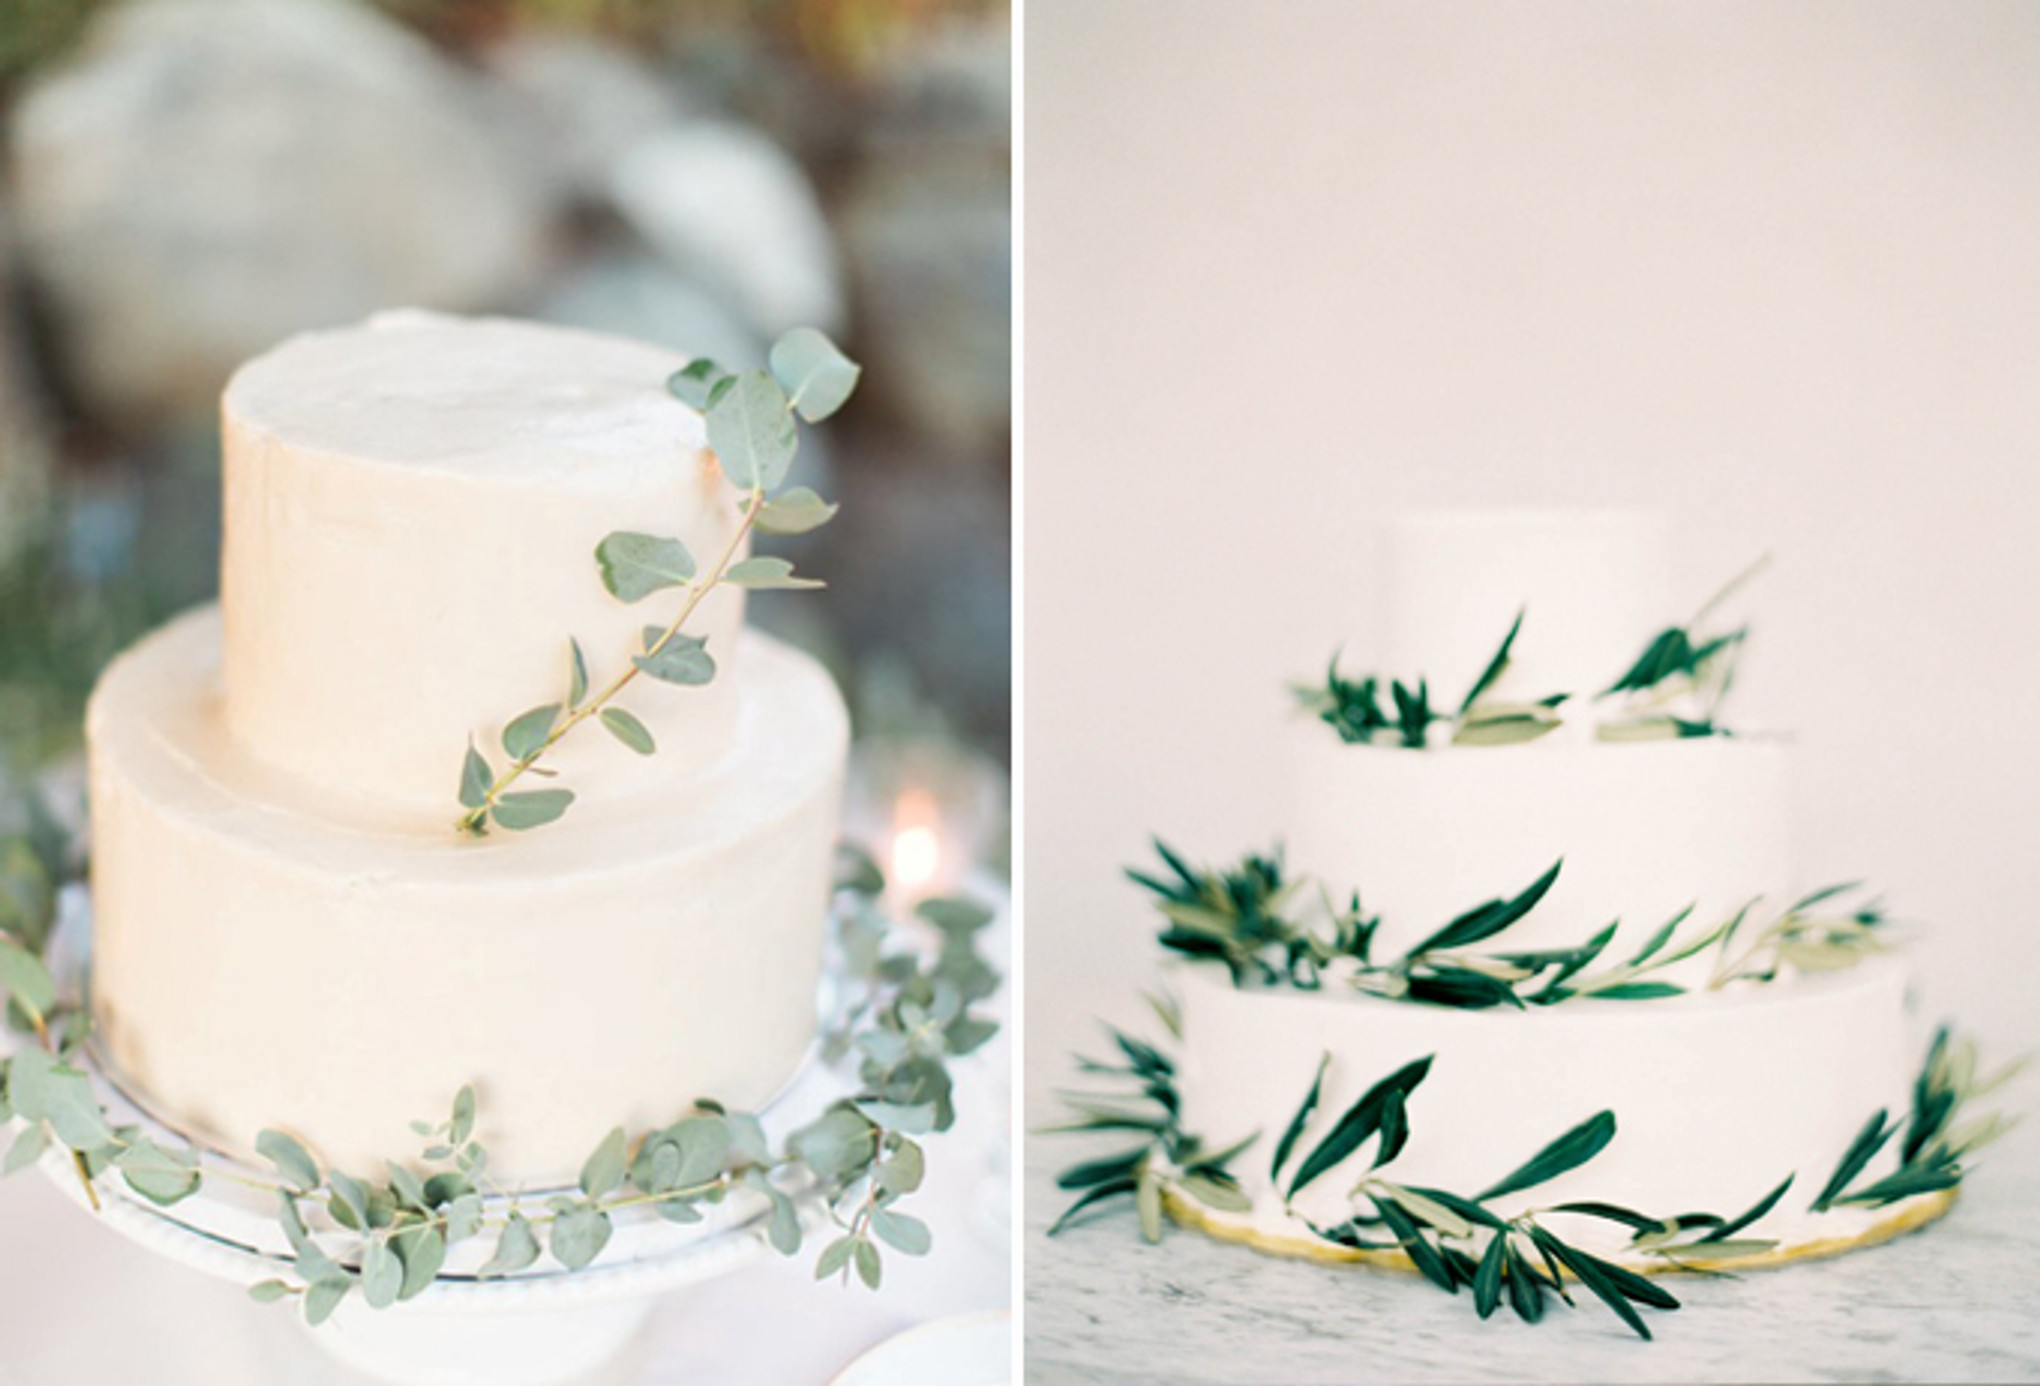 Wedding Cake Ideas.15 Mouthwatering Green Botanical Wedding Cake Ideas Bridestory Blog